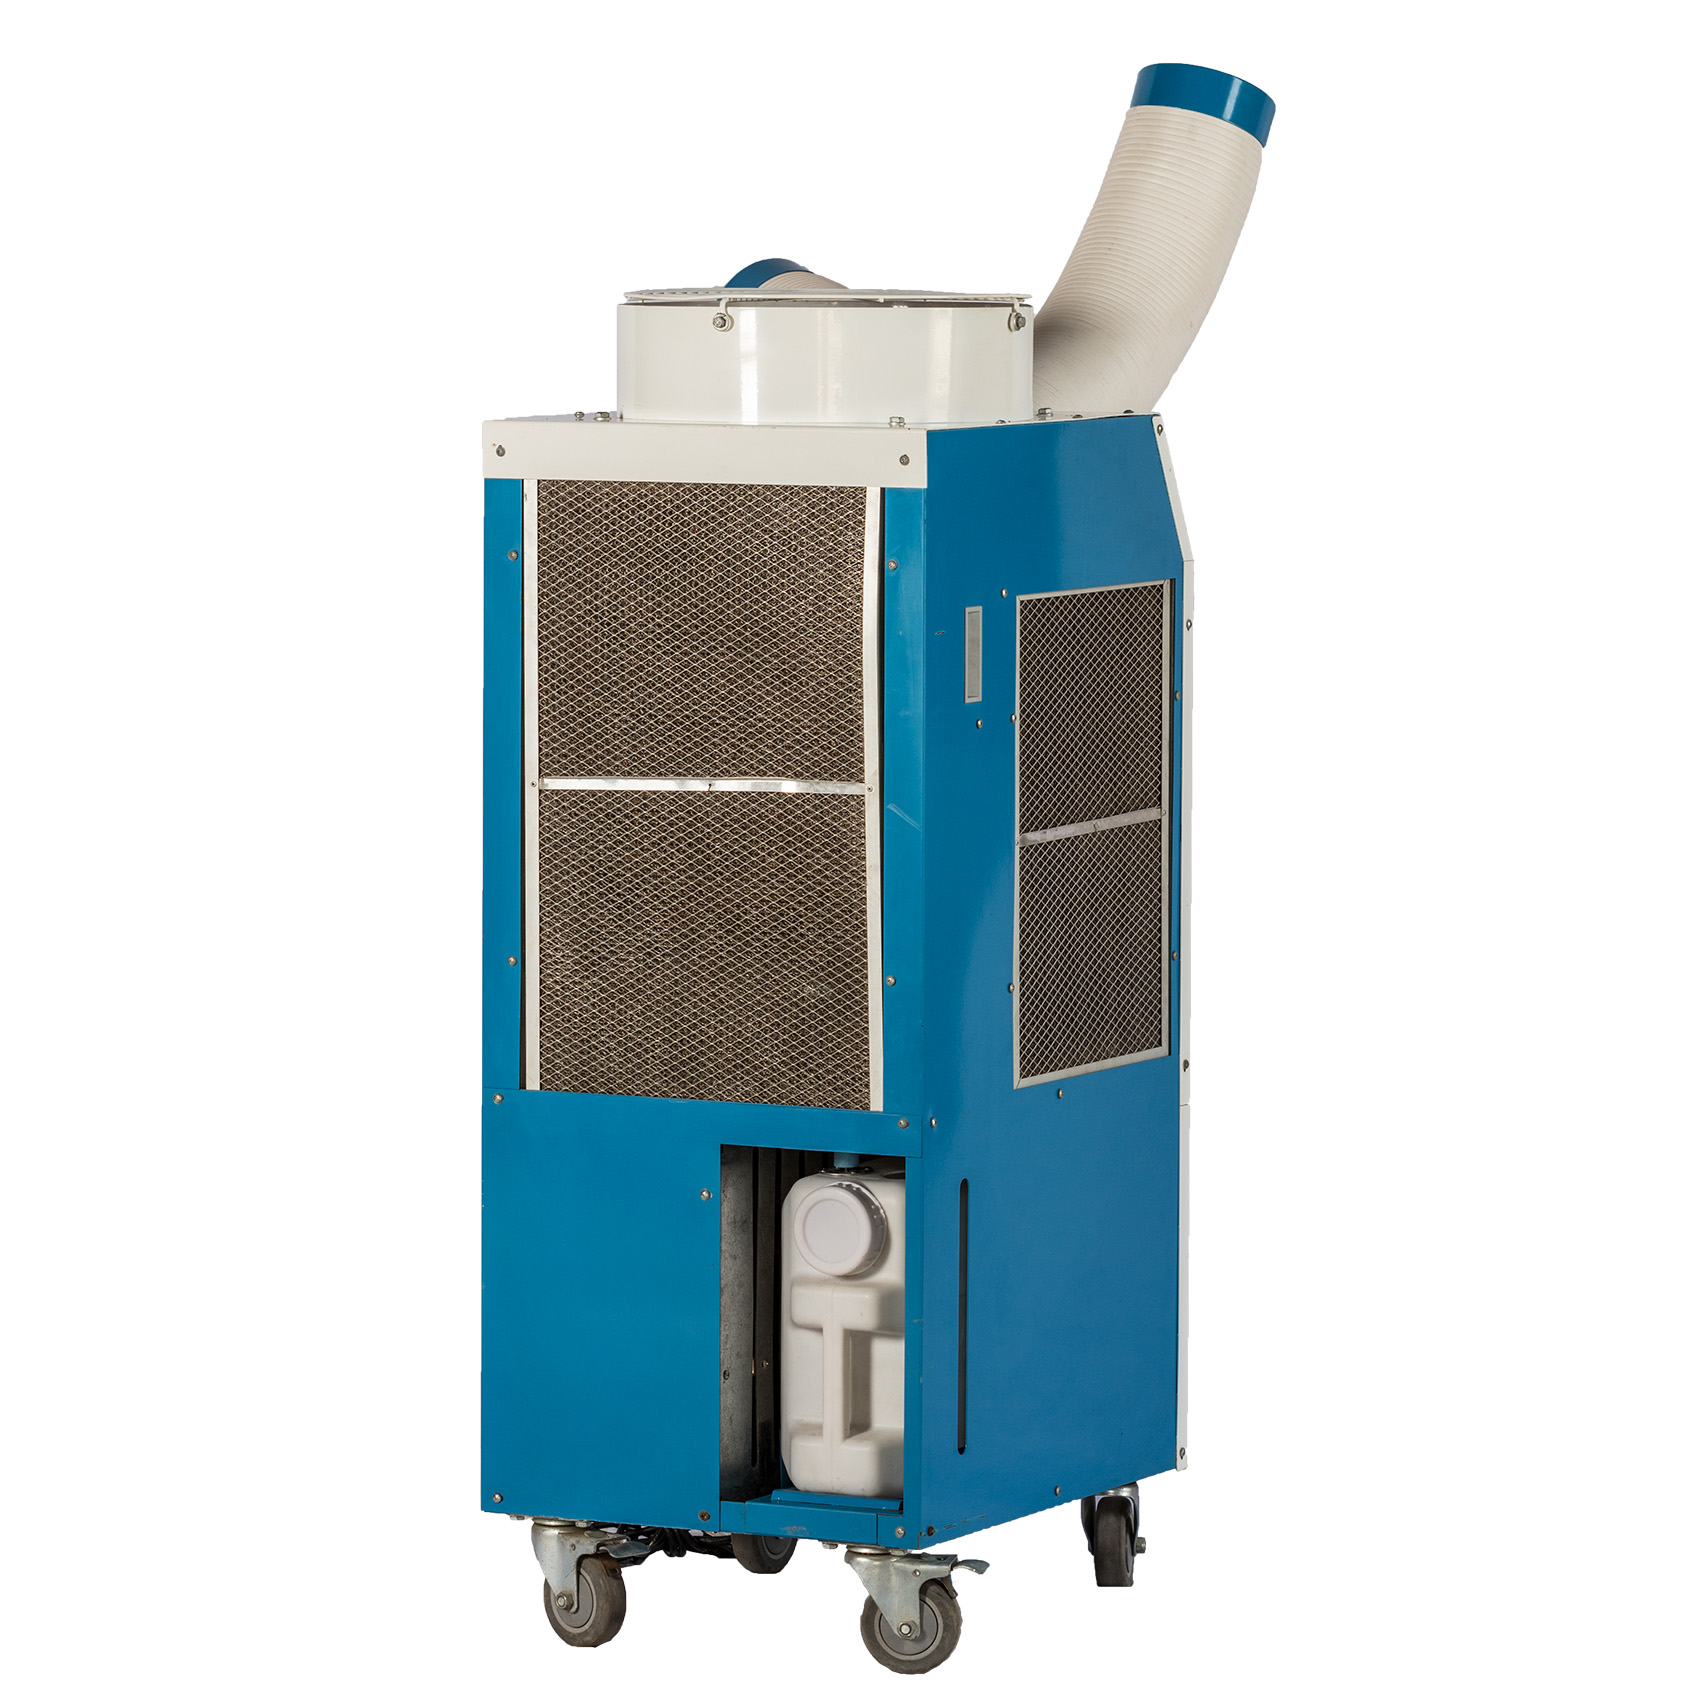 Industrial Air Cooler Portable Wk Cooler Fan Big Fan